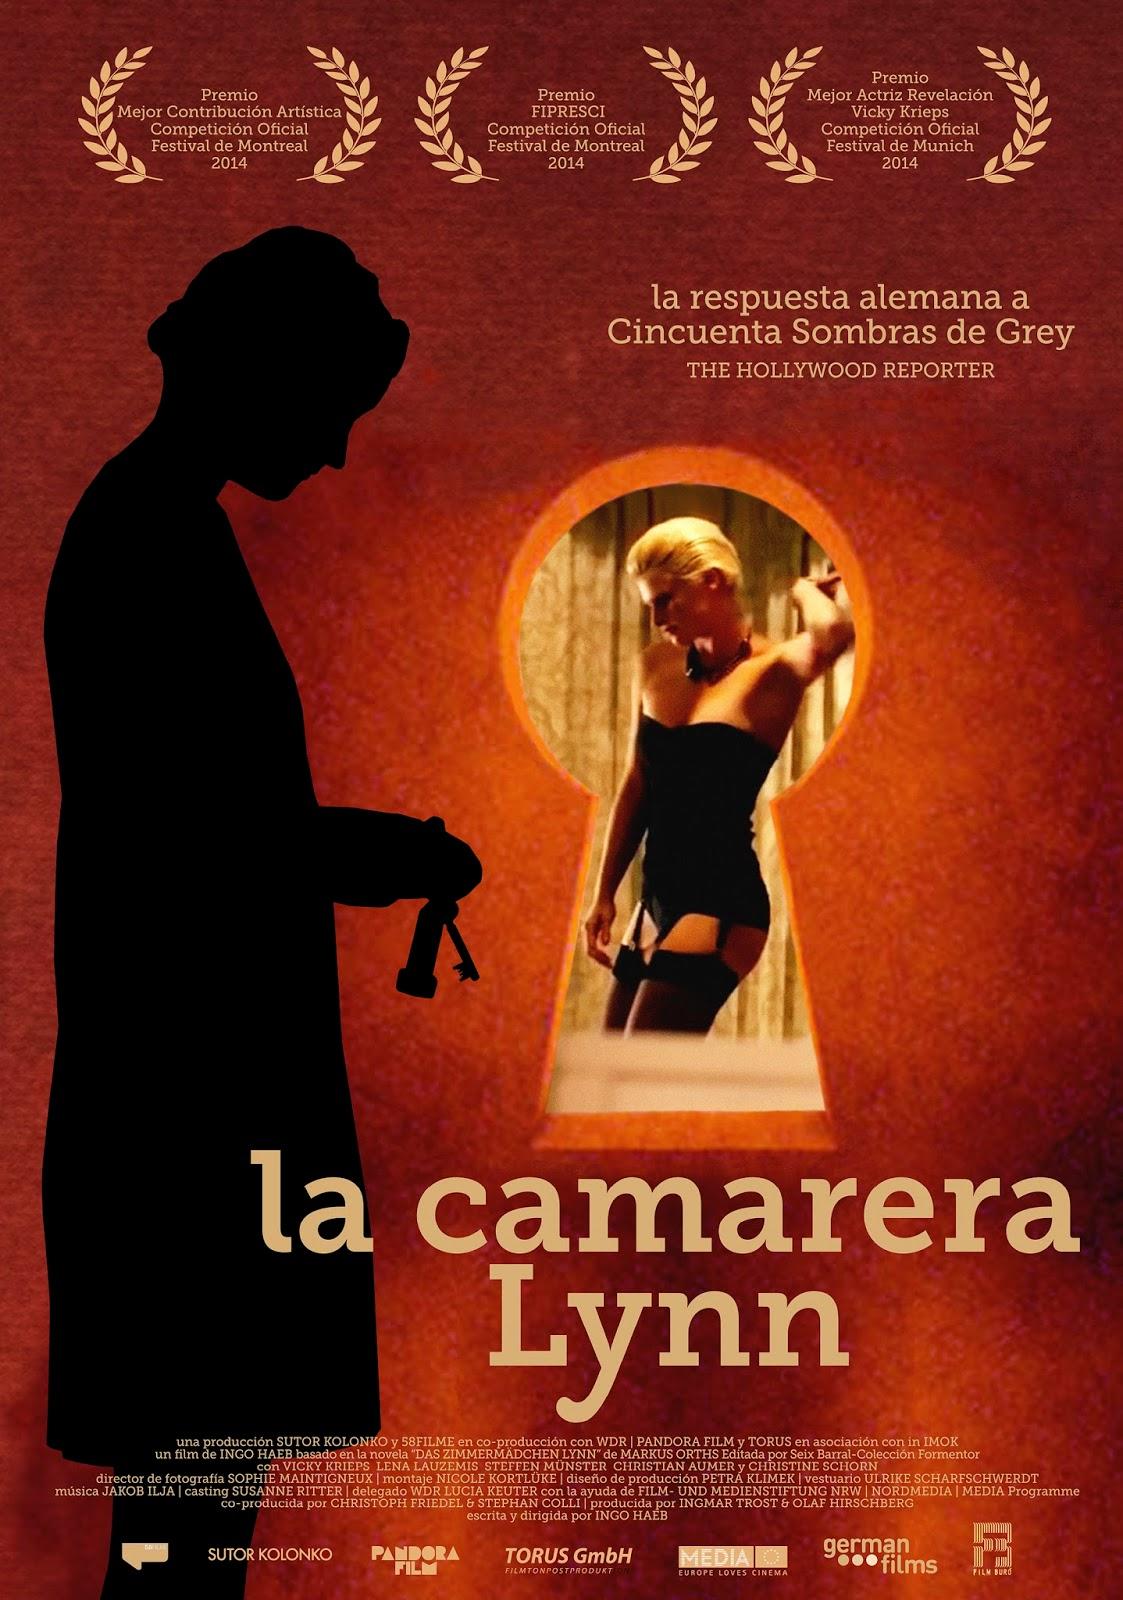 La camarera Lynn (2014)